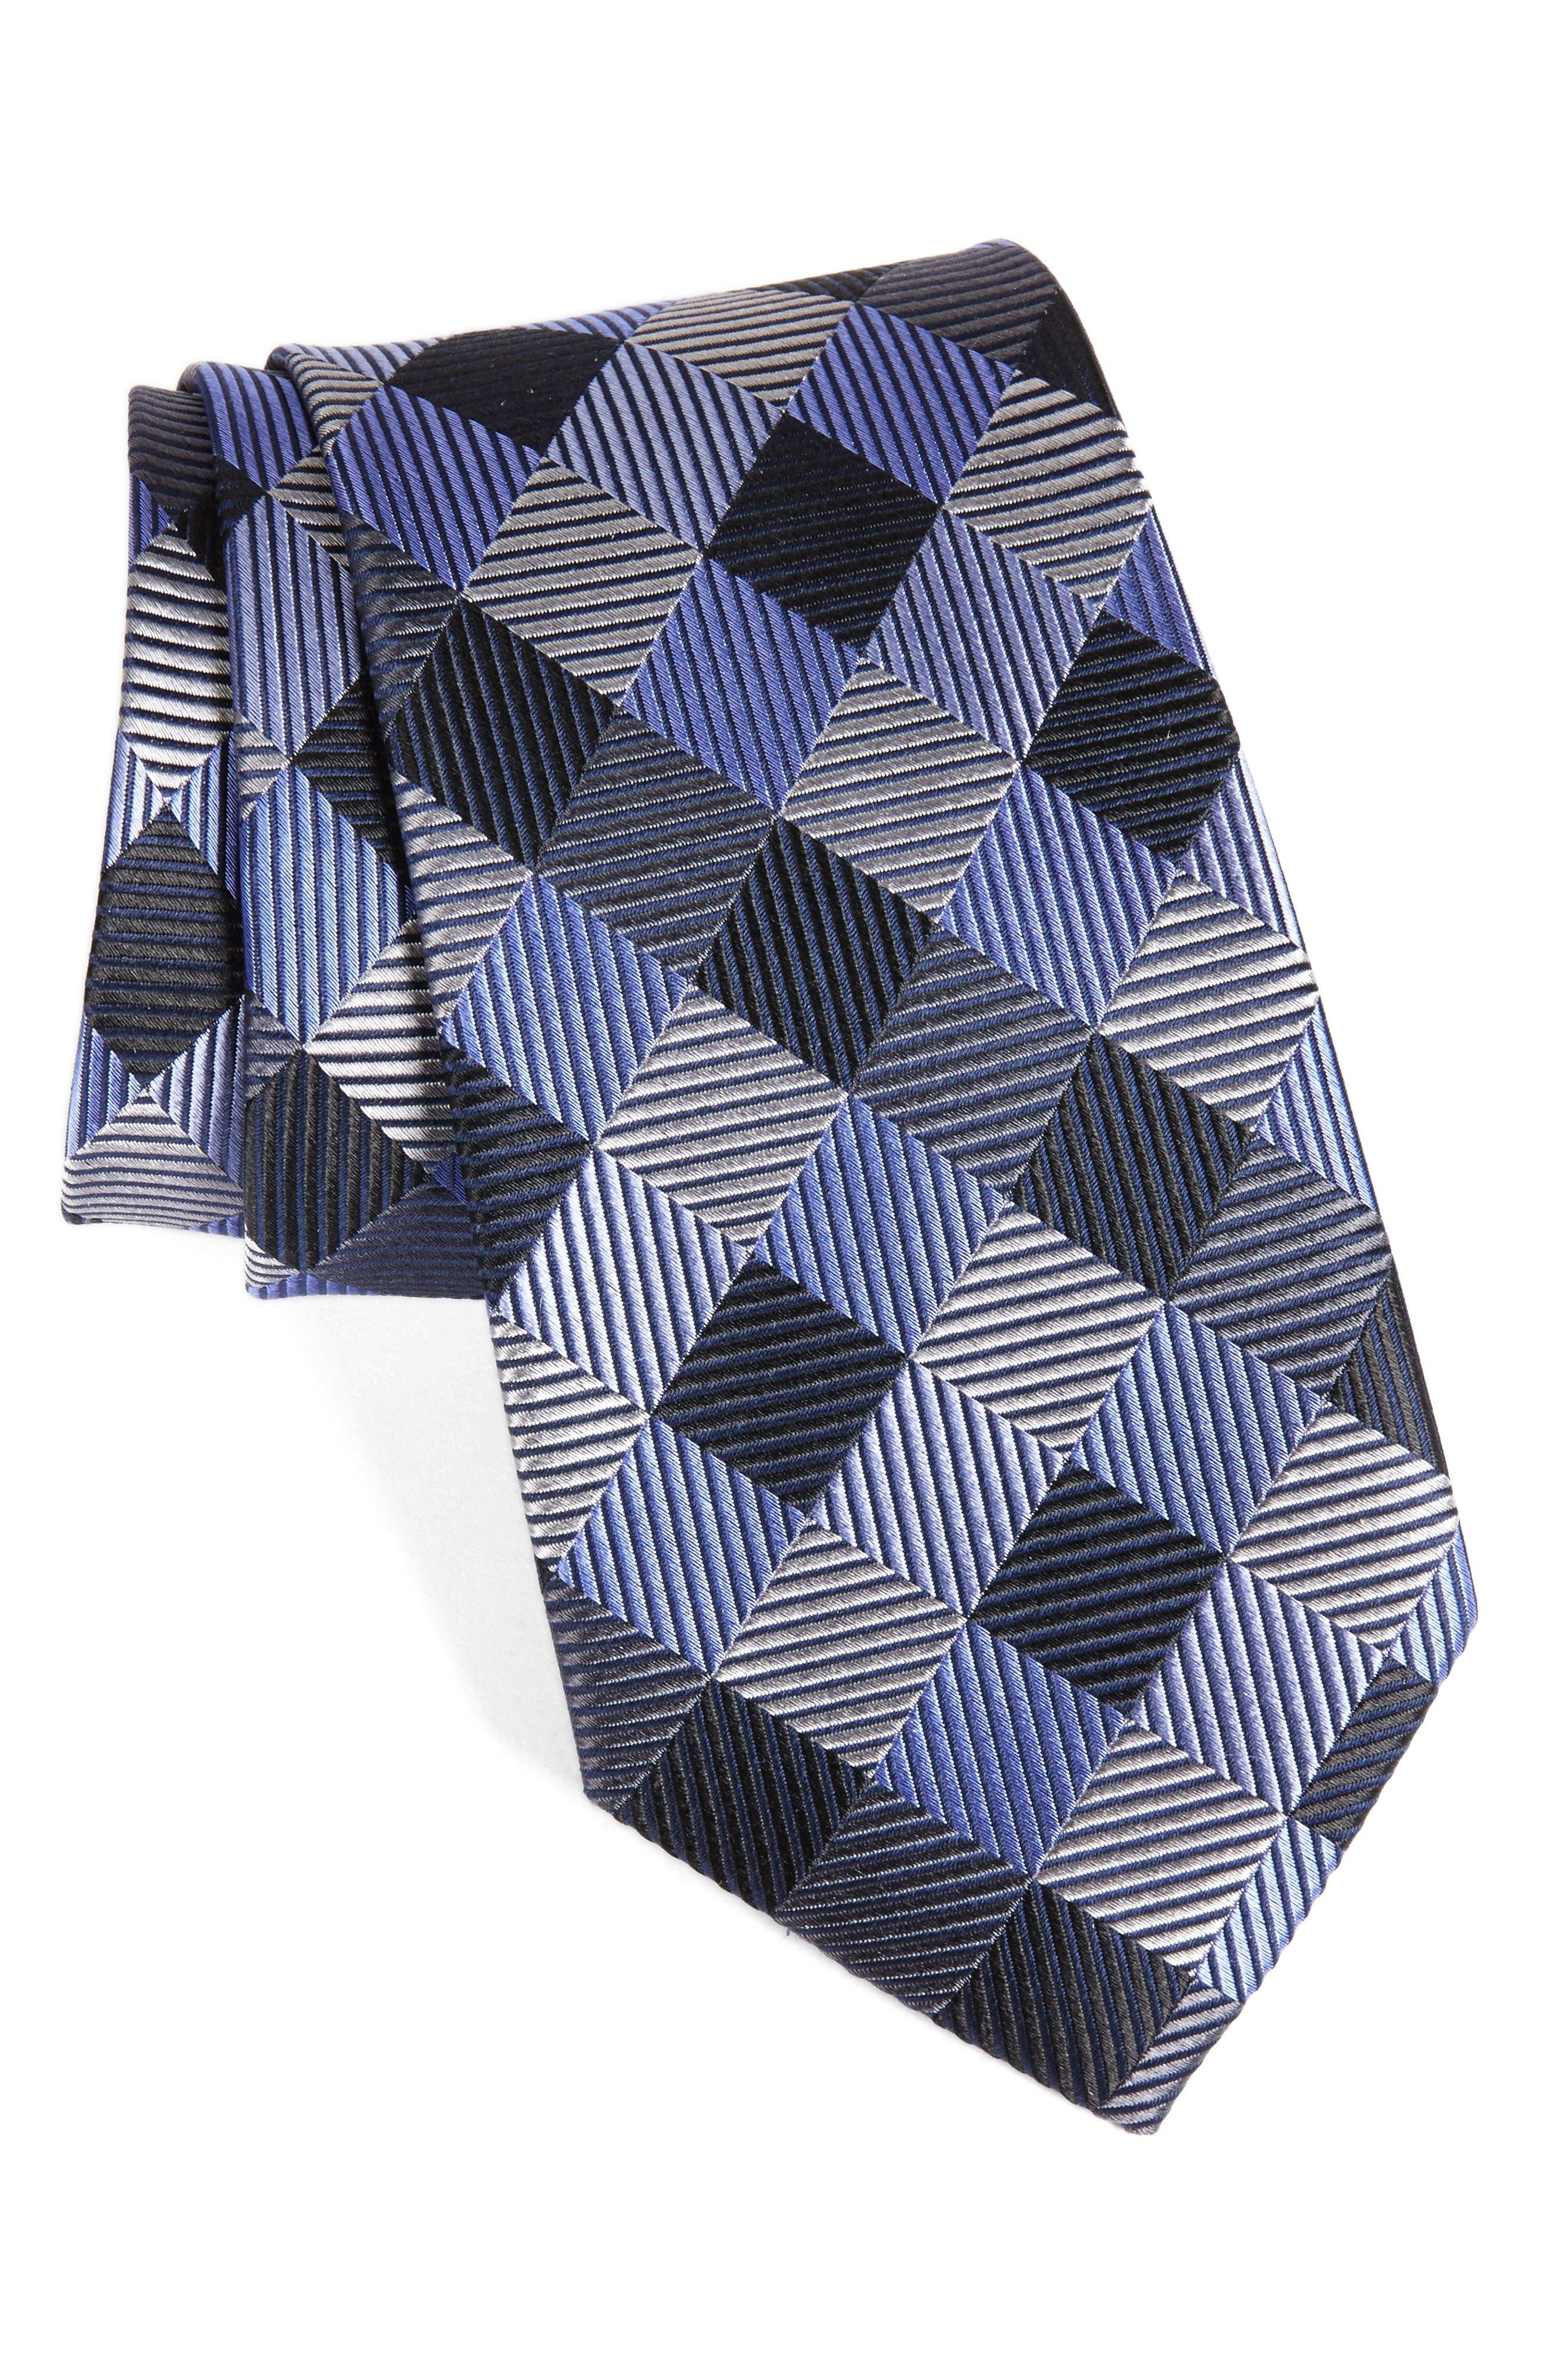 Alternate Image 1 Selected - Nordstrom Men's Shop Check Silk Tie